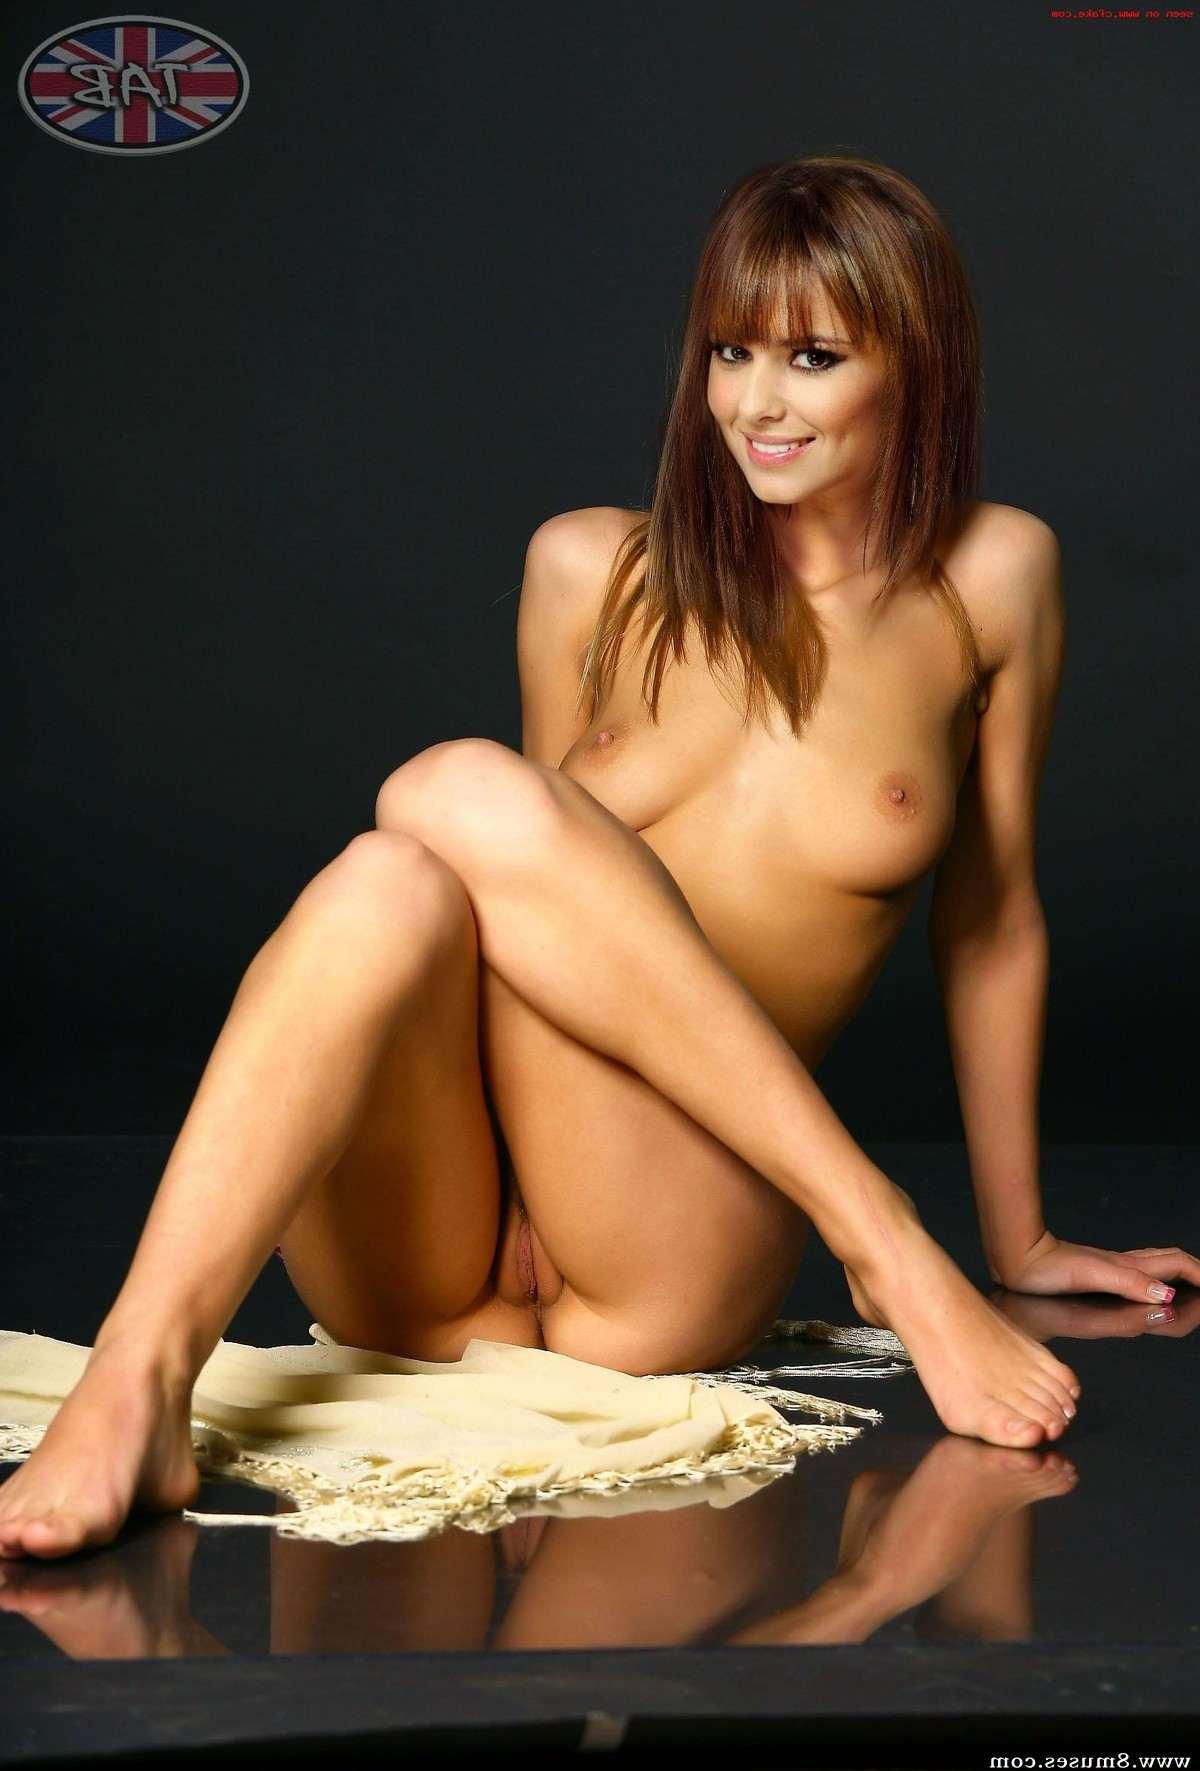 Fake-Celebrities-Sex-Pictures/Cheryl-Tweedy Cheryl__Tweedy__8muses_-_Sex_and_Porn_Comics_79.jpg